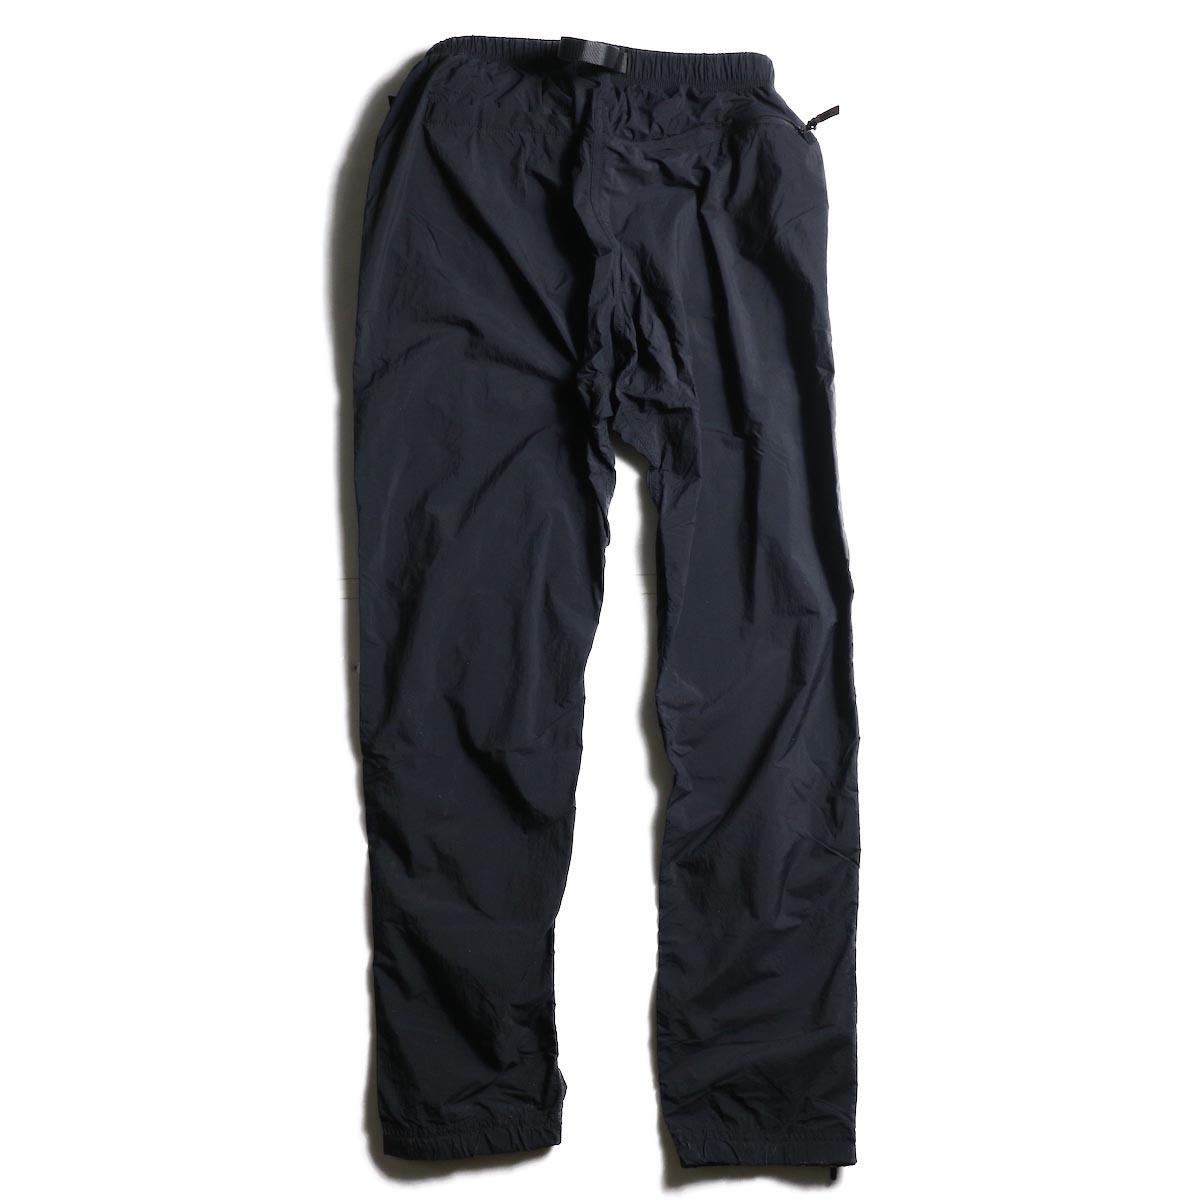 GRAMICCI / Packable Truck Pants (Black) 背面